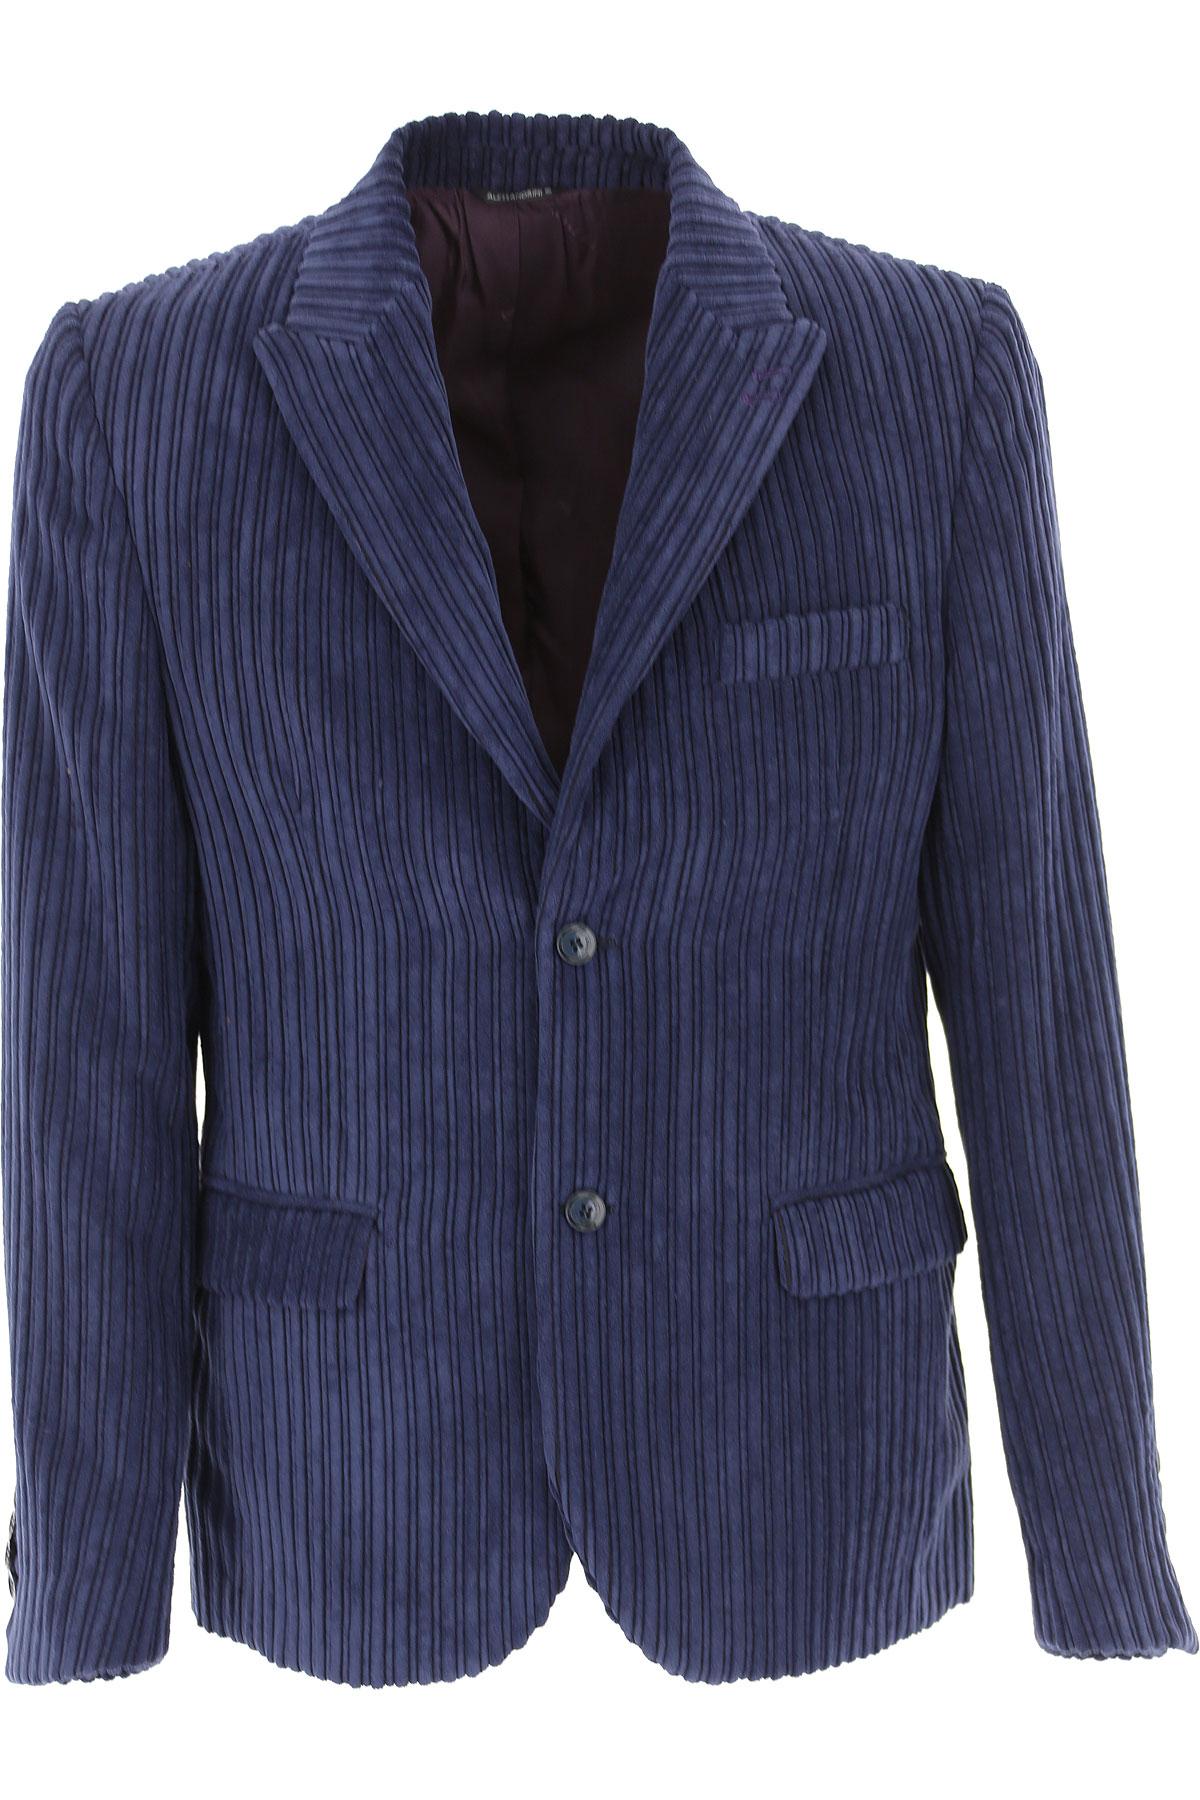 Daniele Alessandrini Blazer for Men, Sport Coat On Sale, Bluette, polyestere, 2019, L M XL